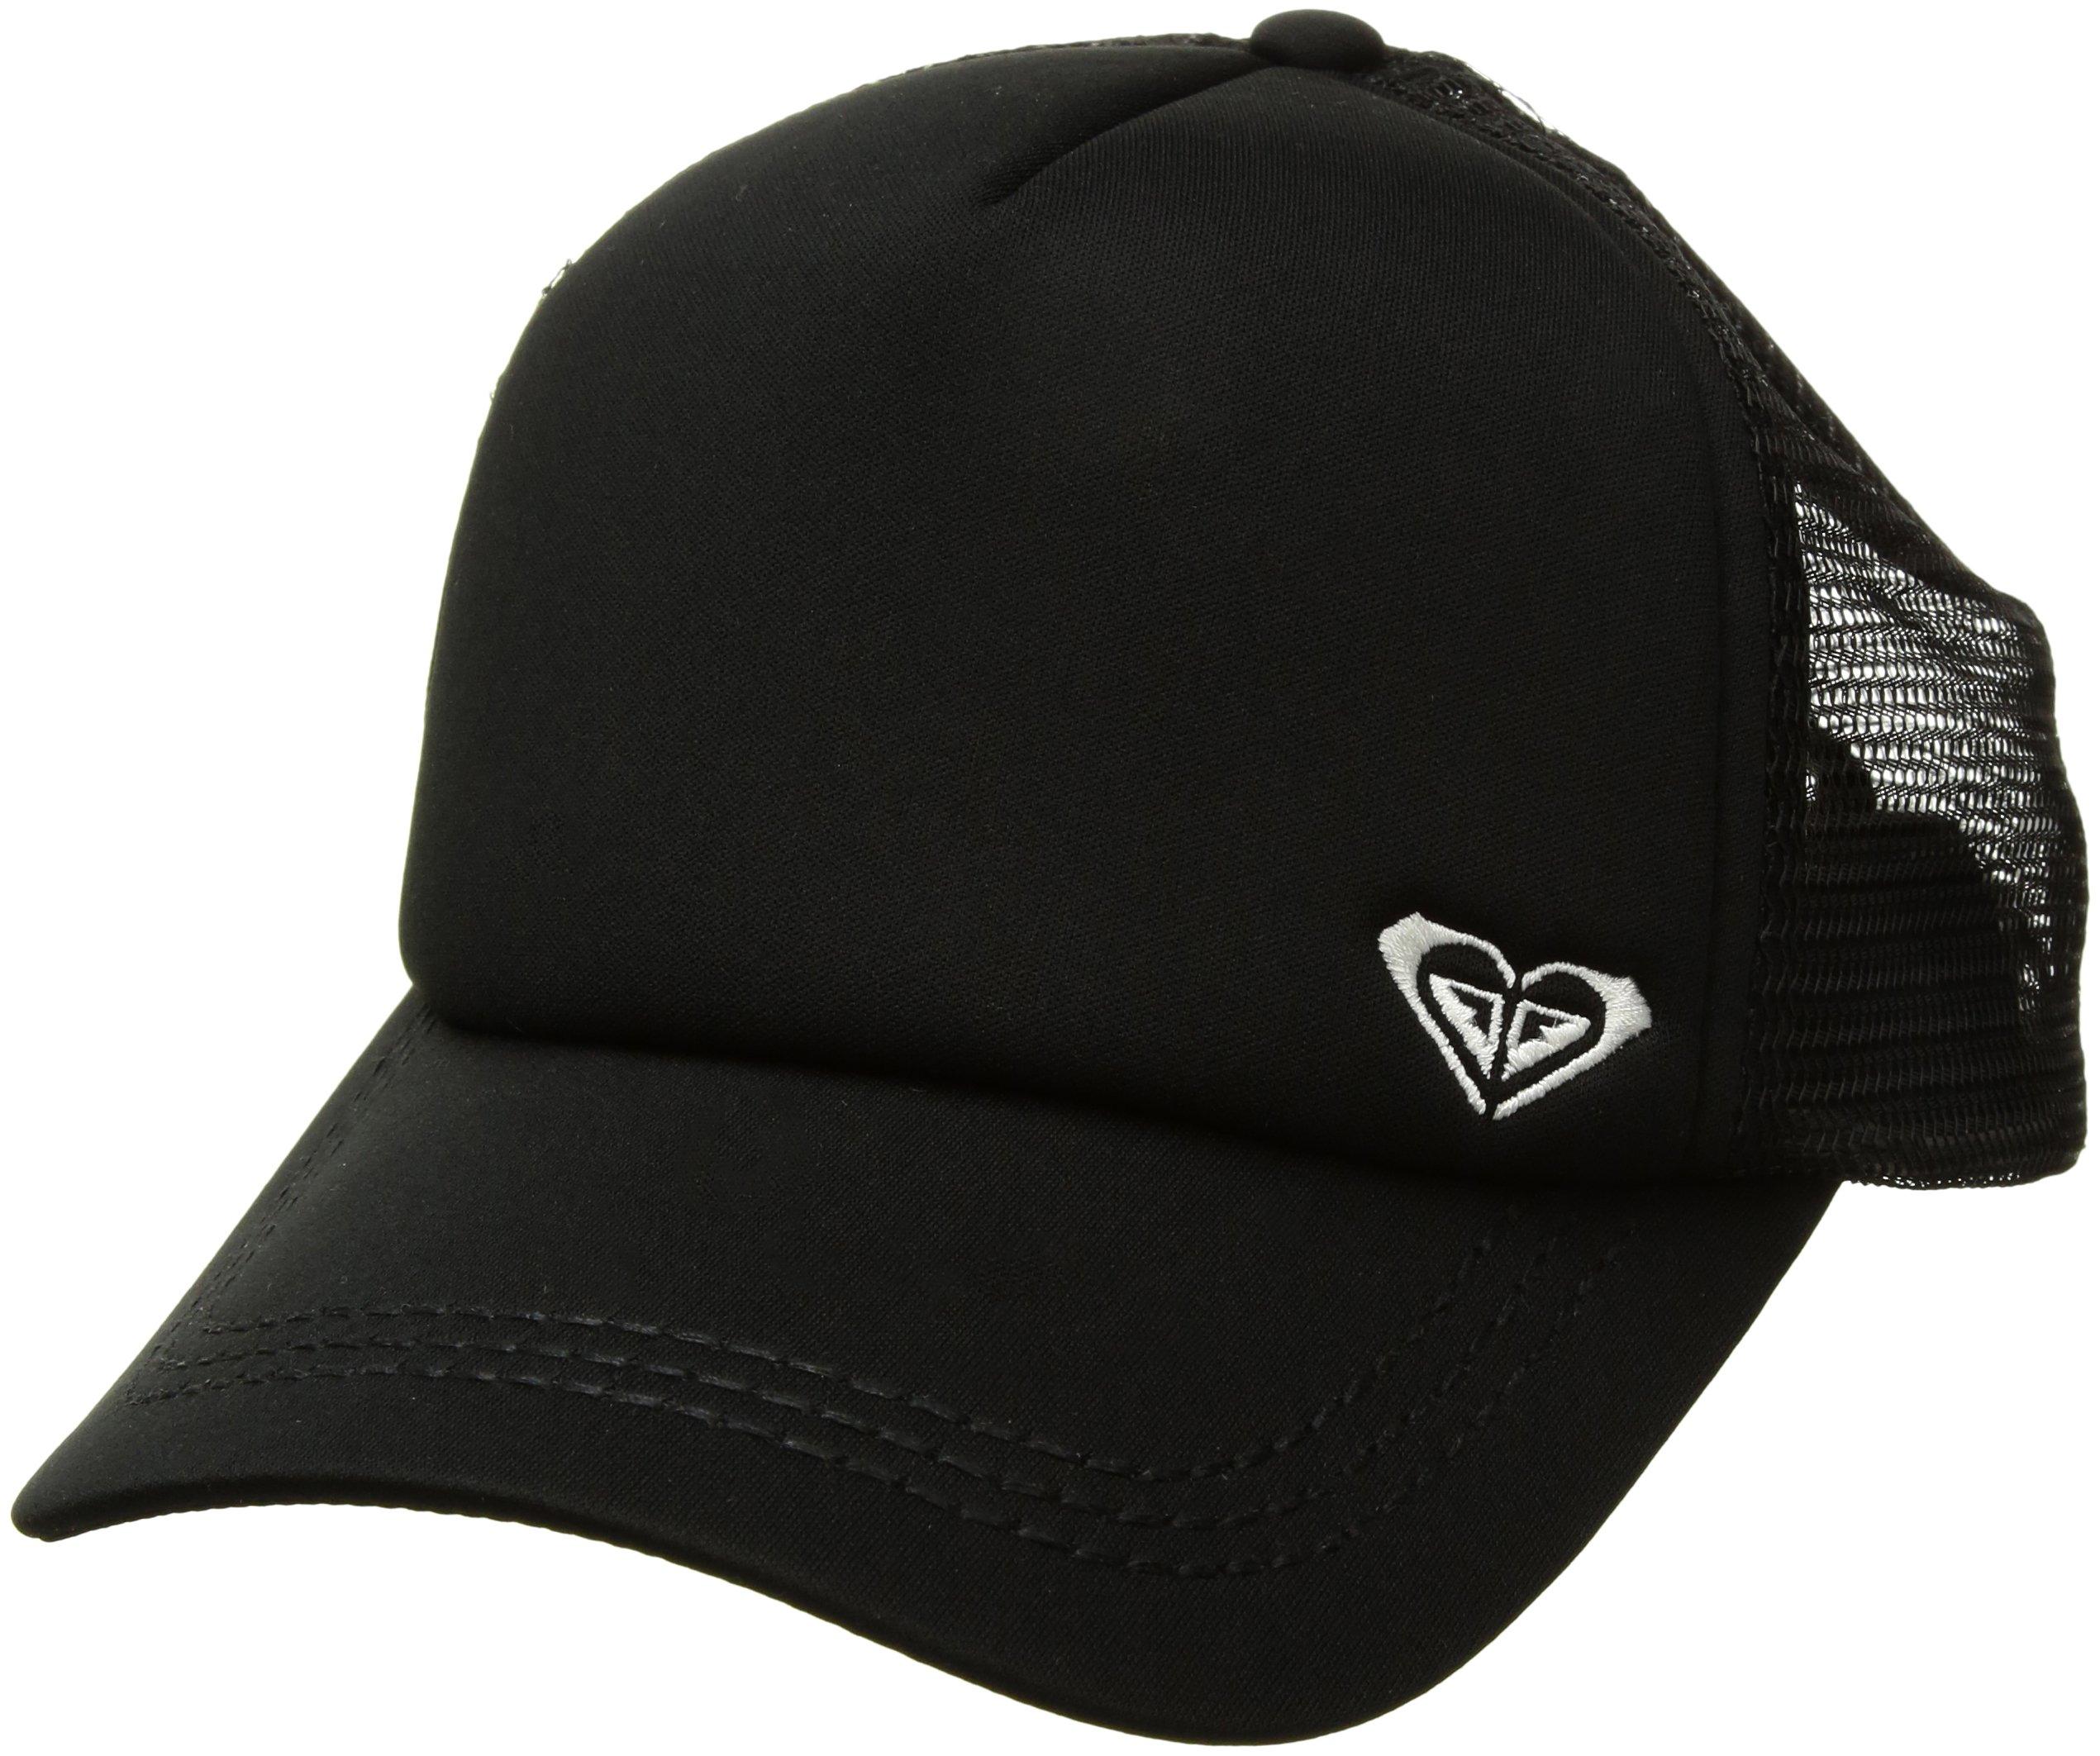 Roxy Women's Finishline Trucker Hat, anthracite One Size by Roxy